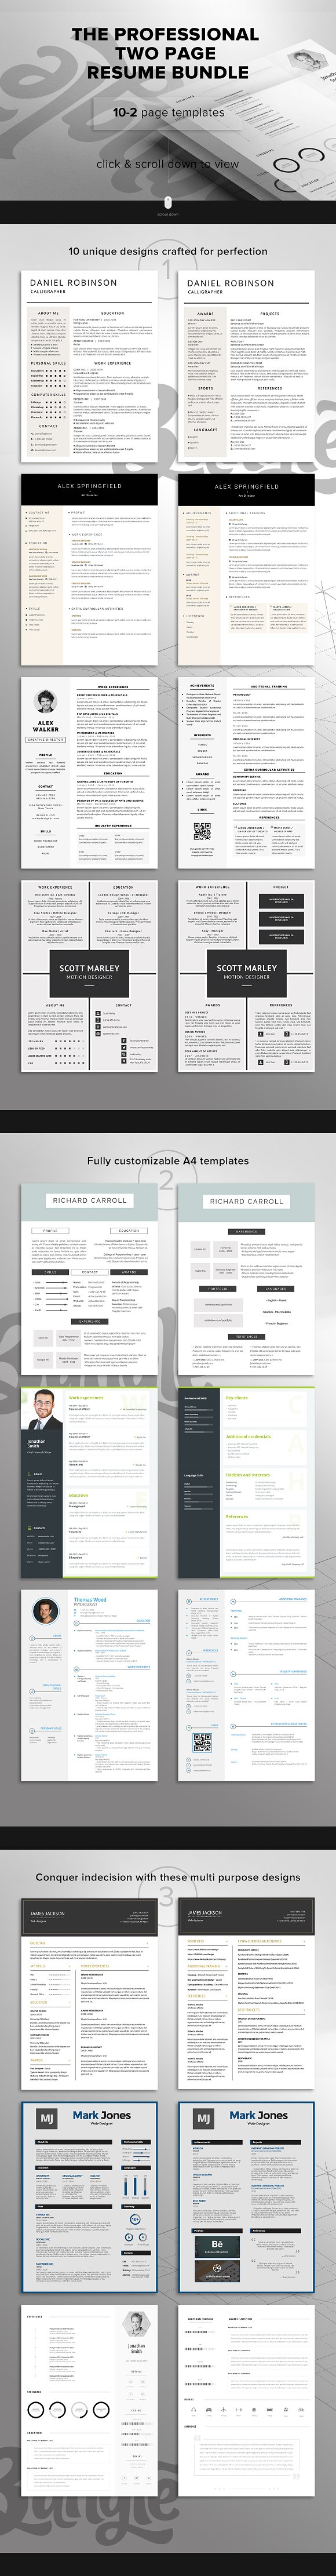 professional 2 page resume bundle resume templates on creative professional 2 page resume bundle resume templates on creative market